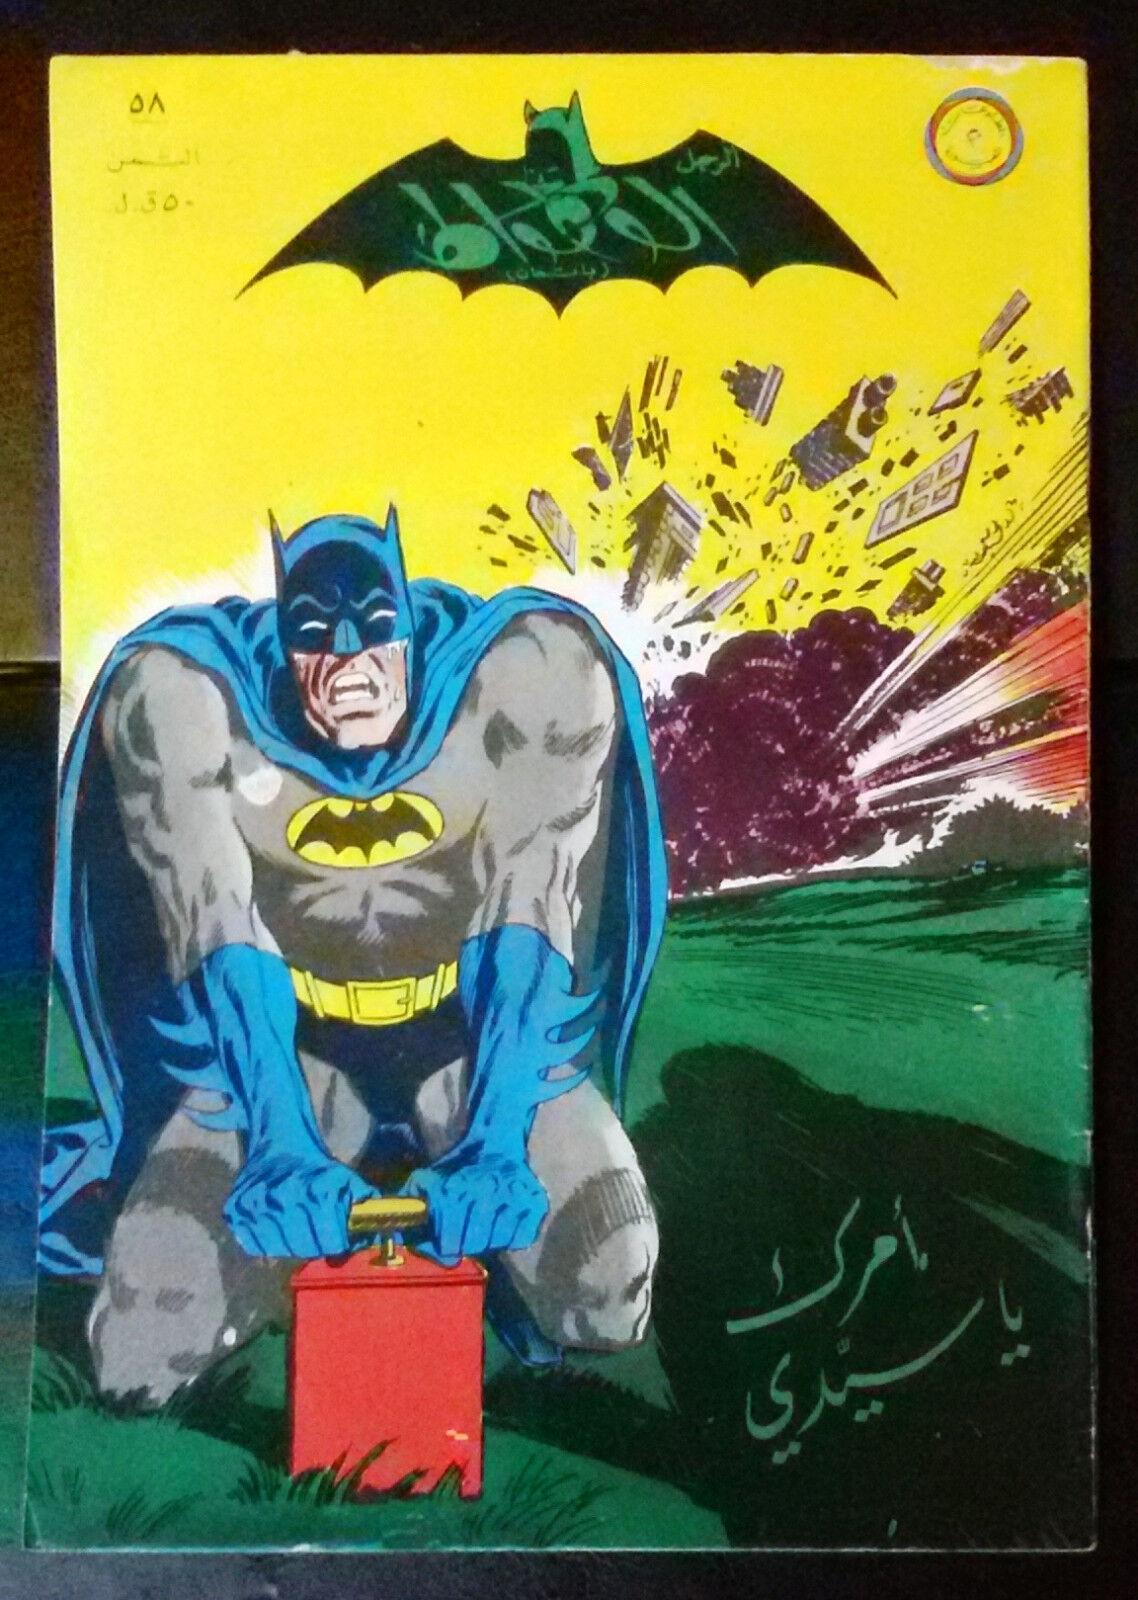 Batman الوطواط Wot-Wat Arabic Comics Lebanese Original   58 Magazine 1970